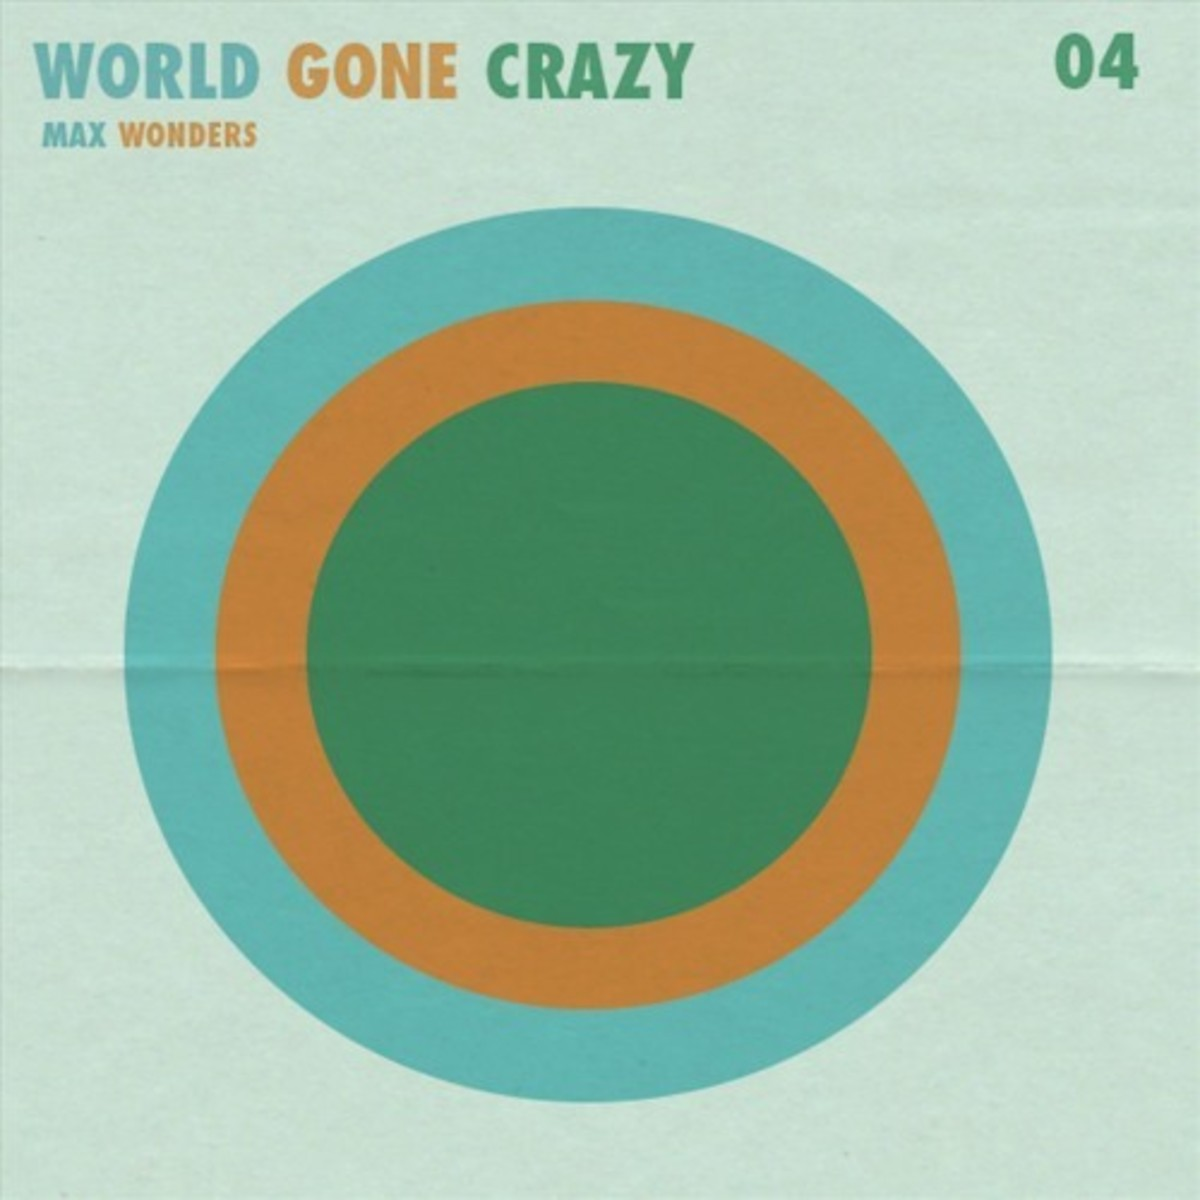 max-wonders-world-gone-crazy.jpg